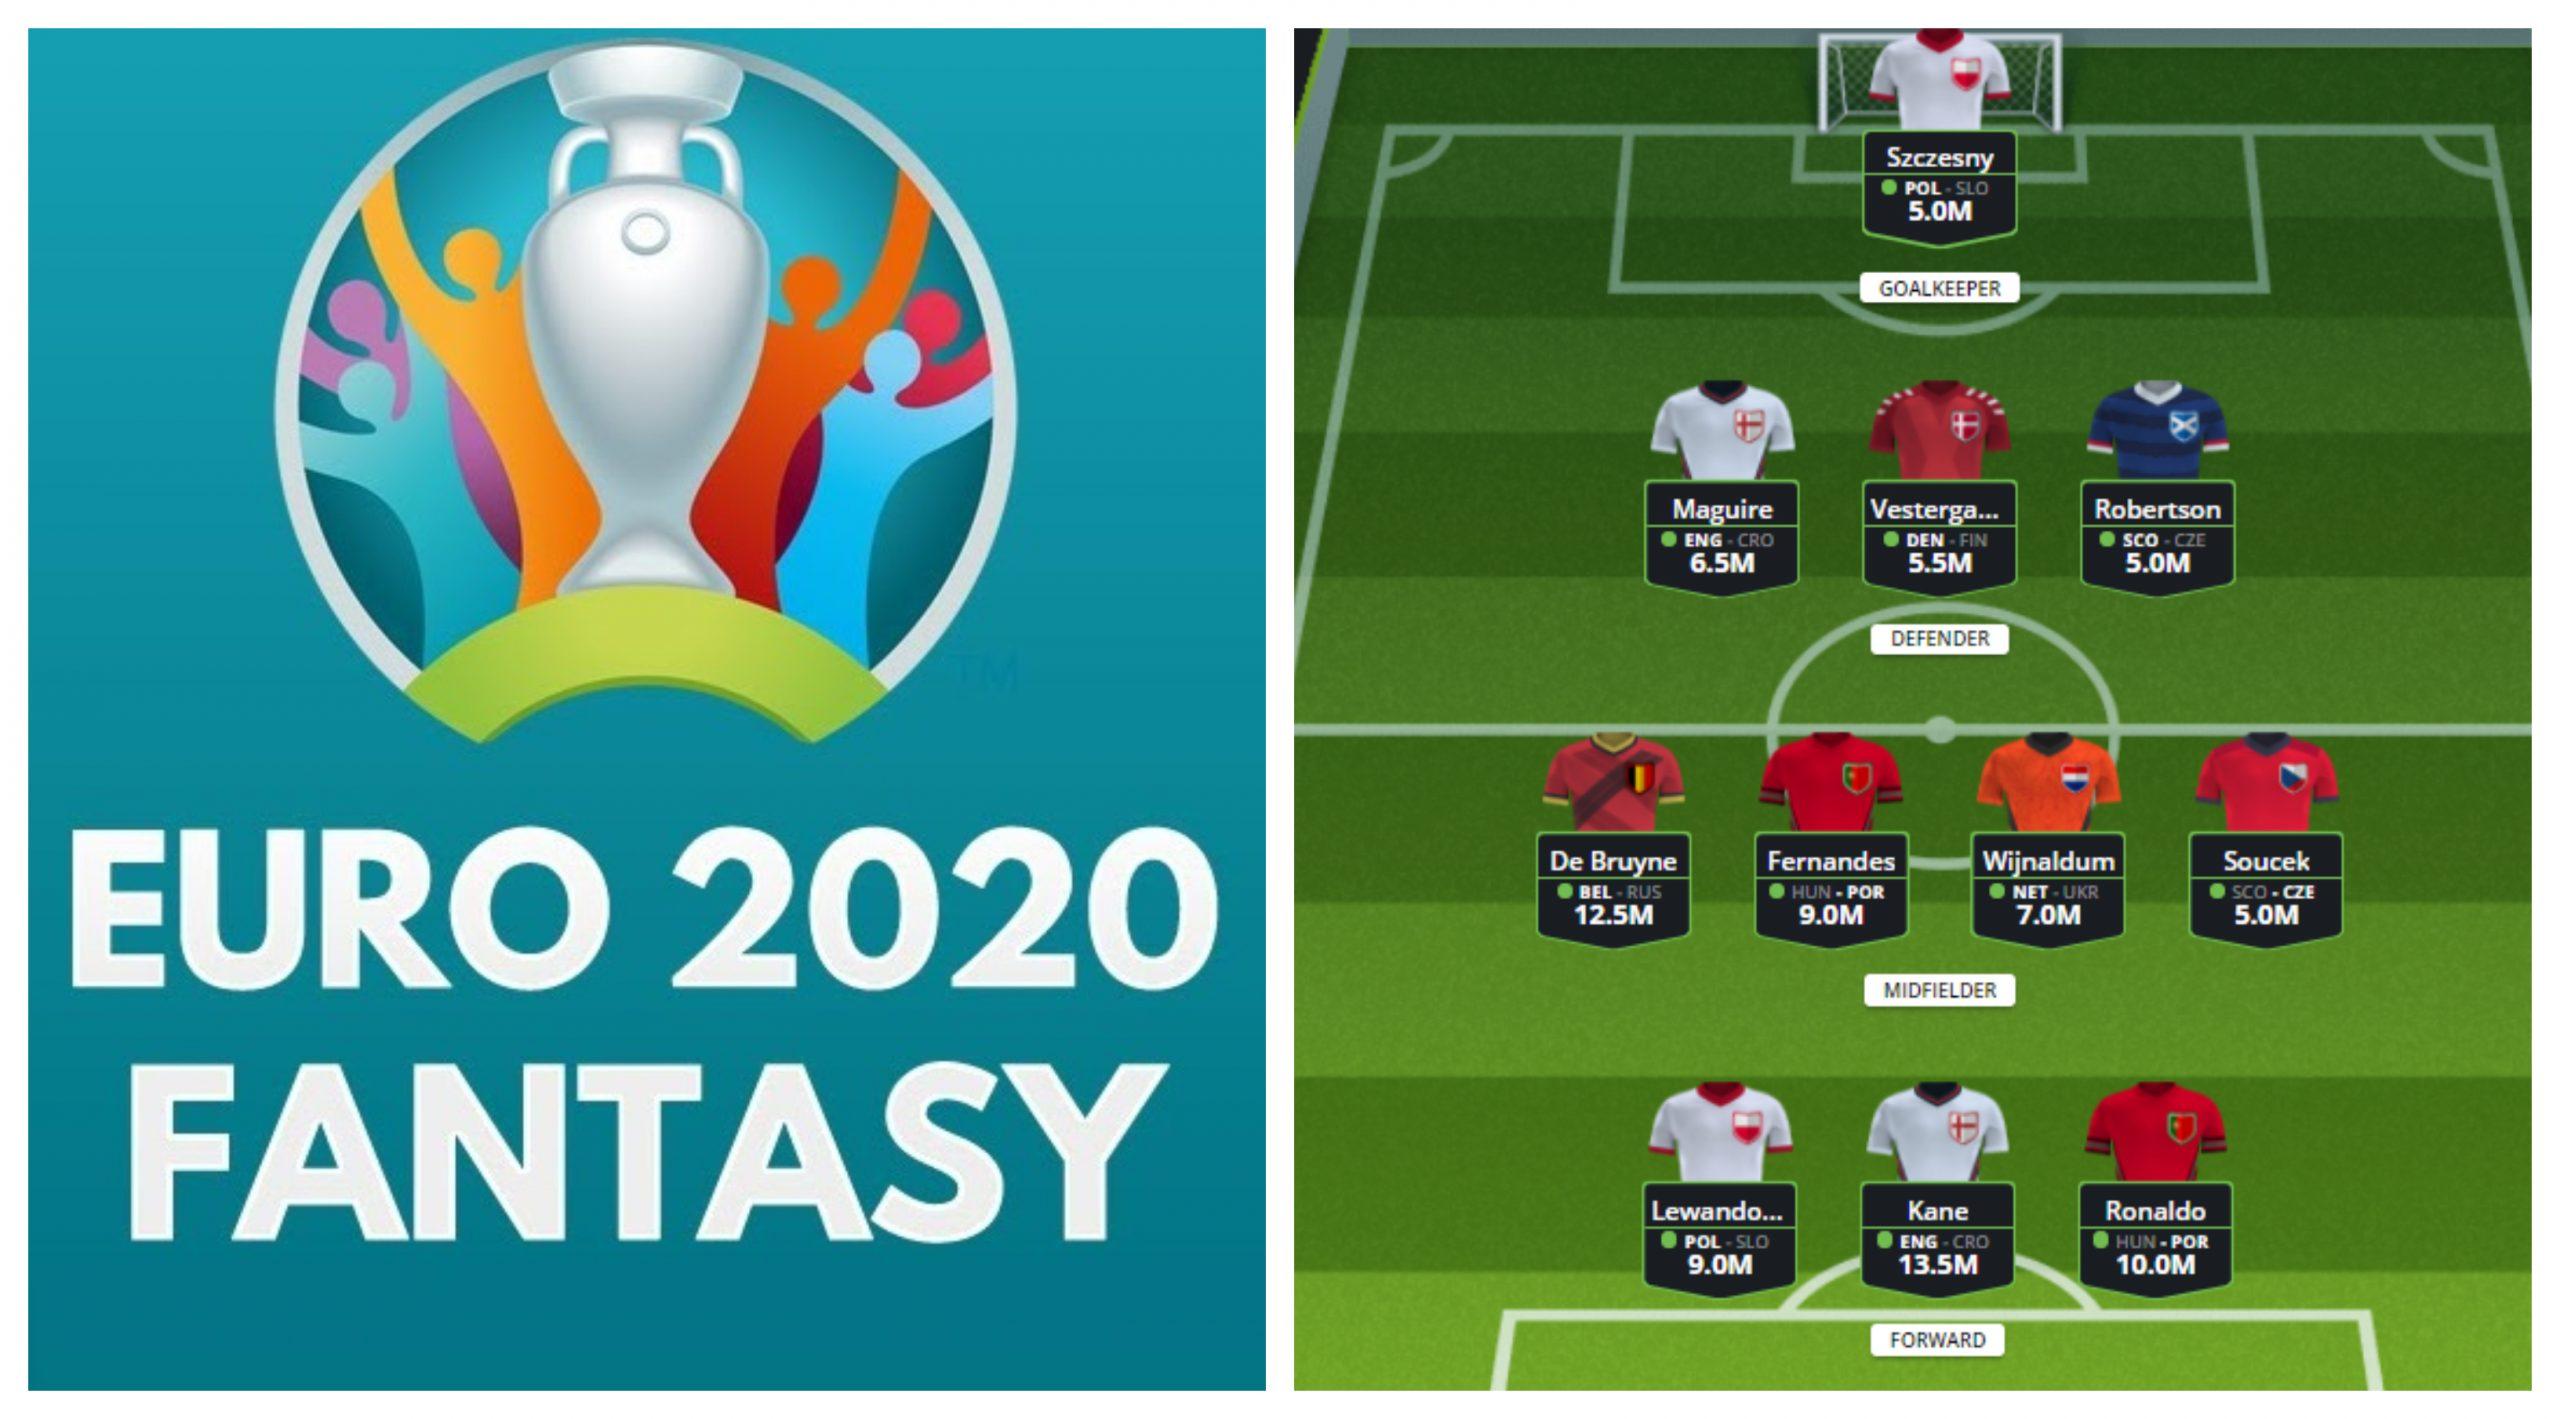 Euro 2020: Οι 8 «ψαγμένες» επιλογές για Fantasy ομάδα που σε δικαίωσαν στο FM!